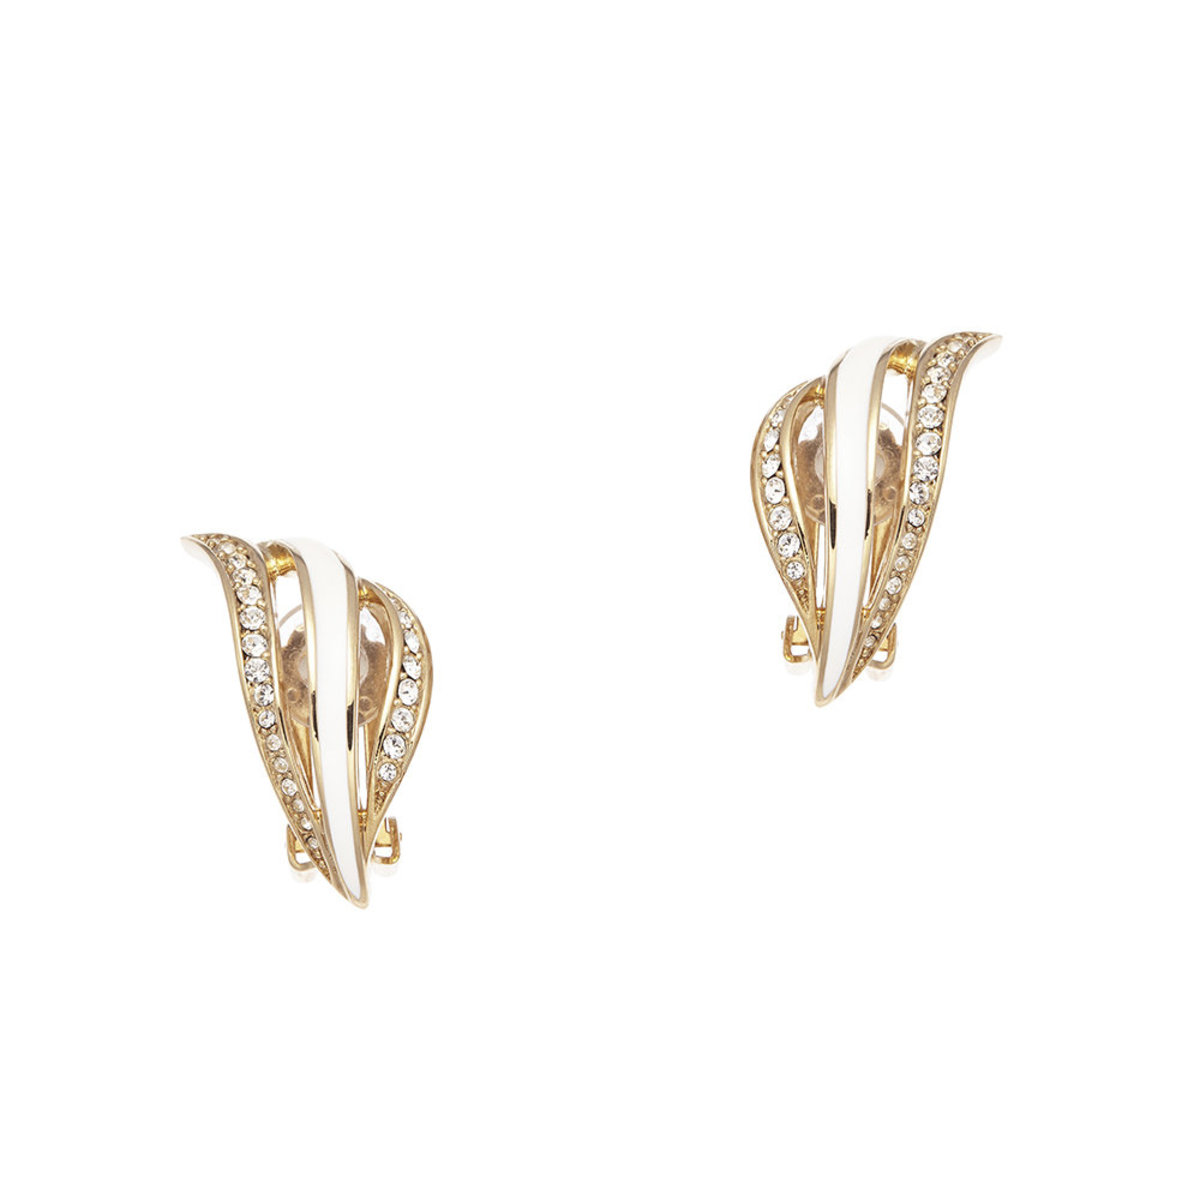 Tresor: gold plating, Swarovski crystal, white enamal clip earrings